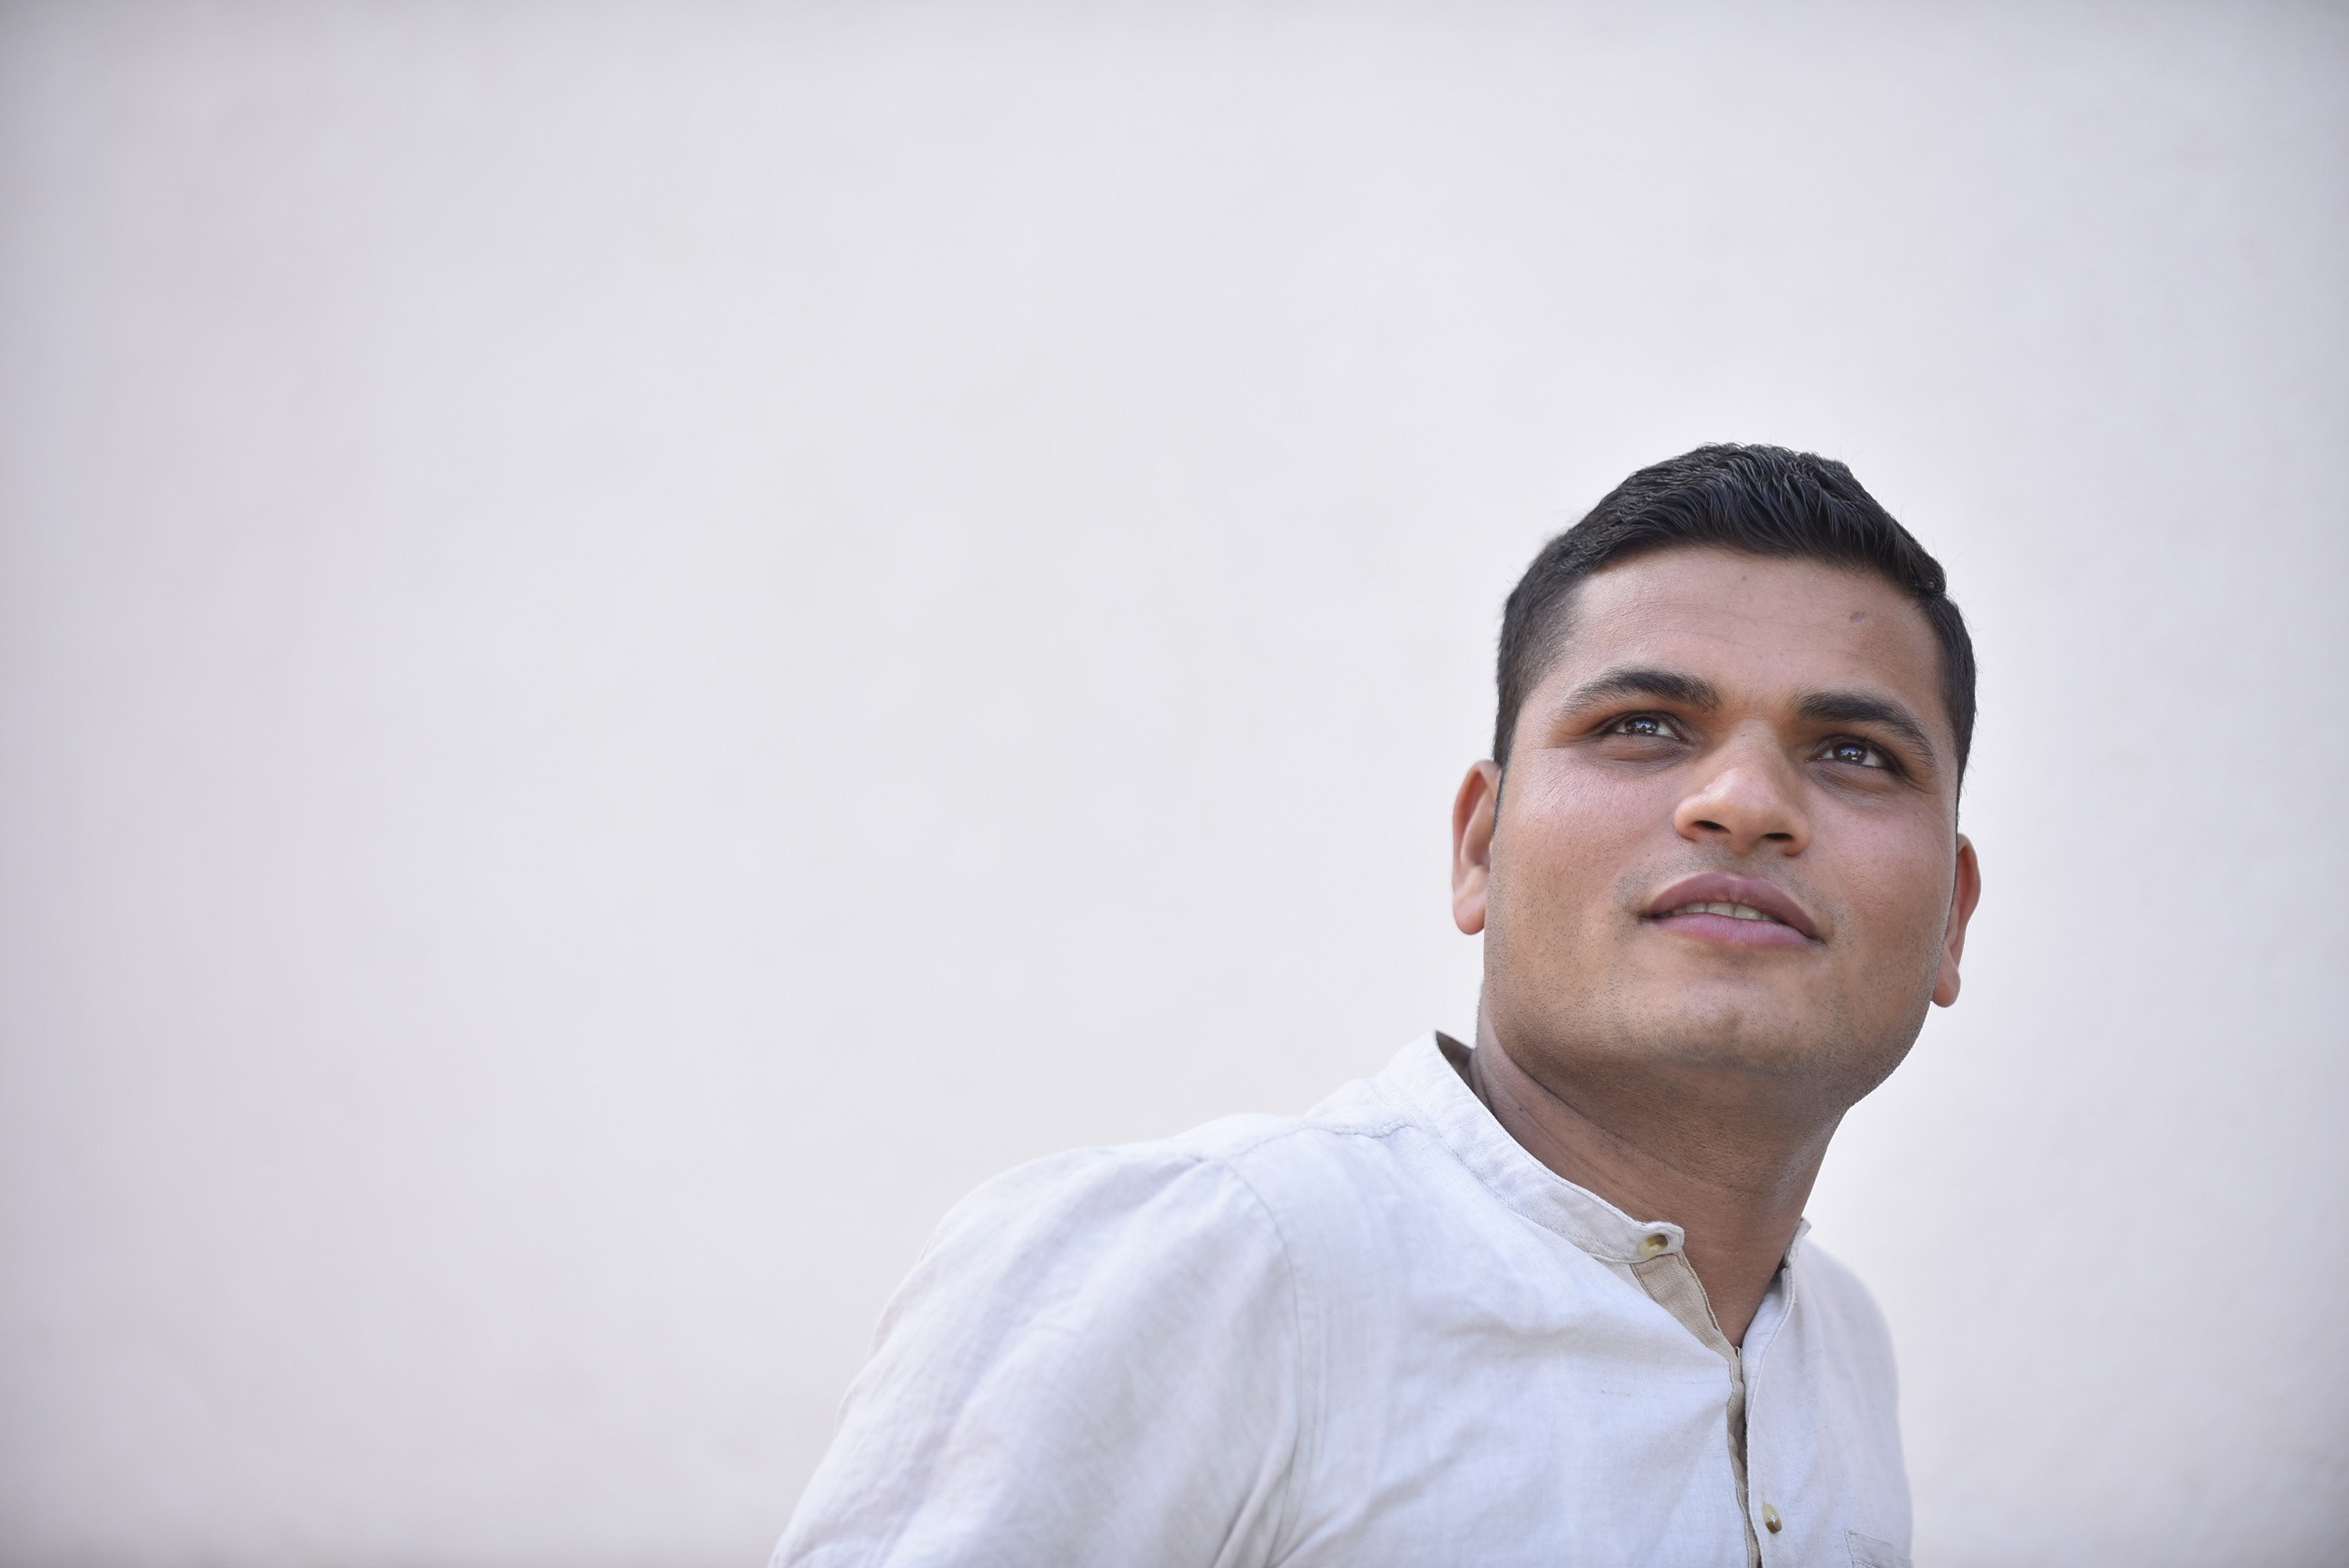 Bhanubhakta Jaishi